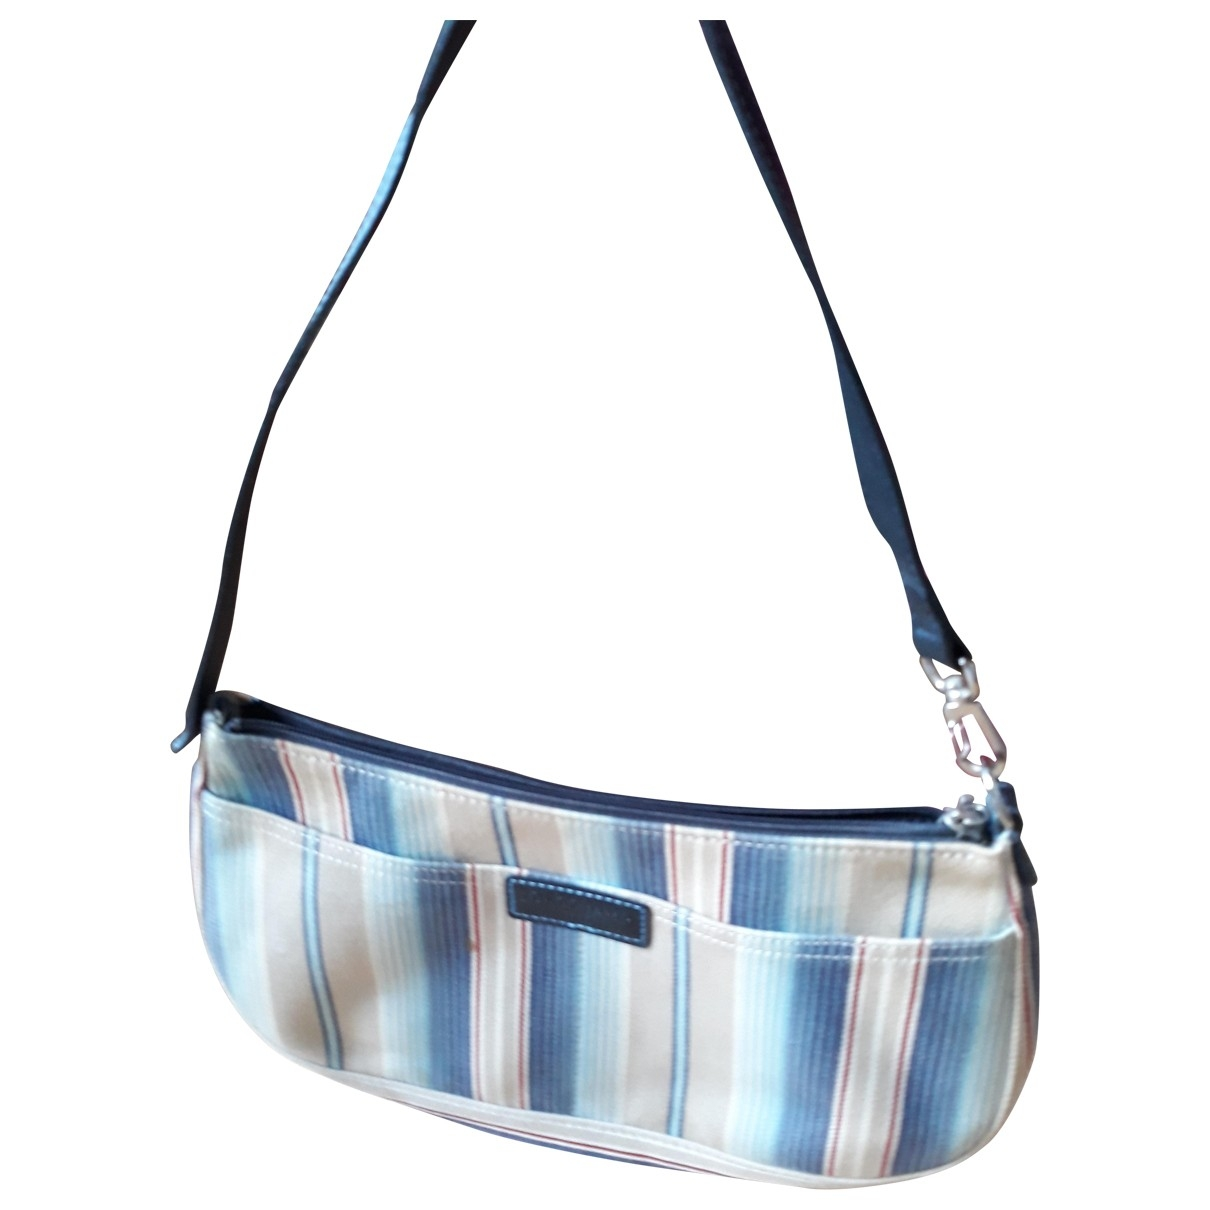 Longchamp - Sac a main   pour femme en coton - bleu